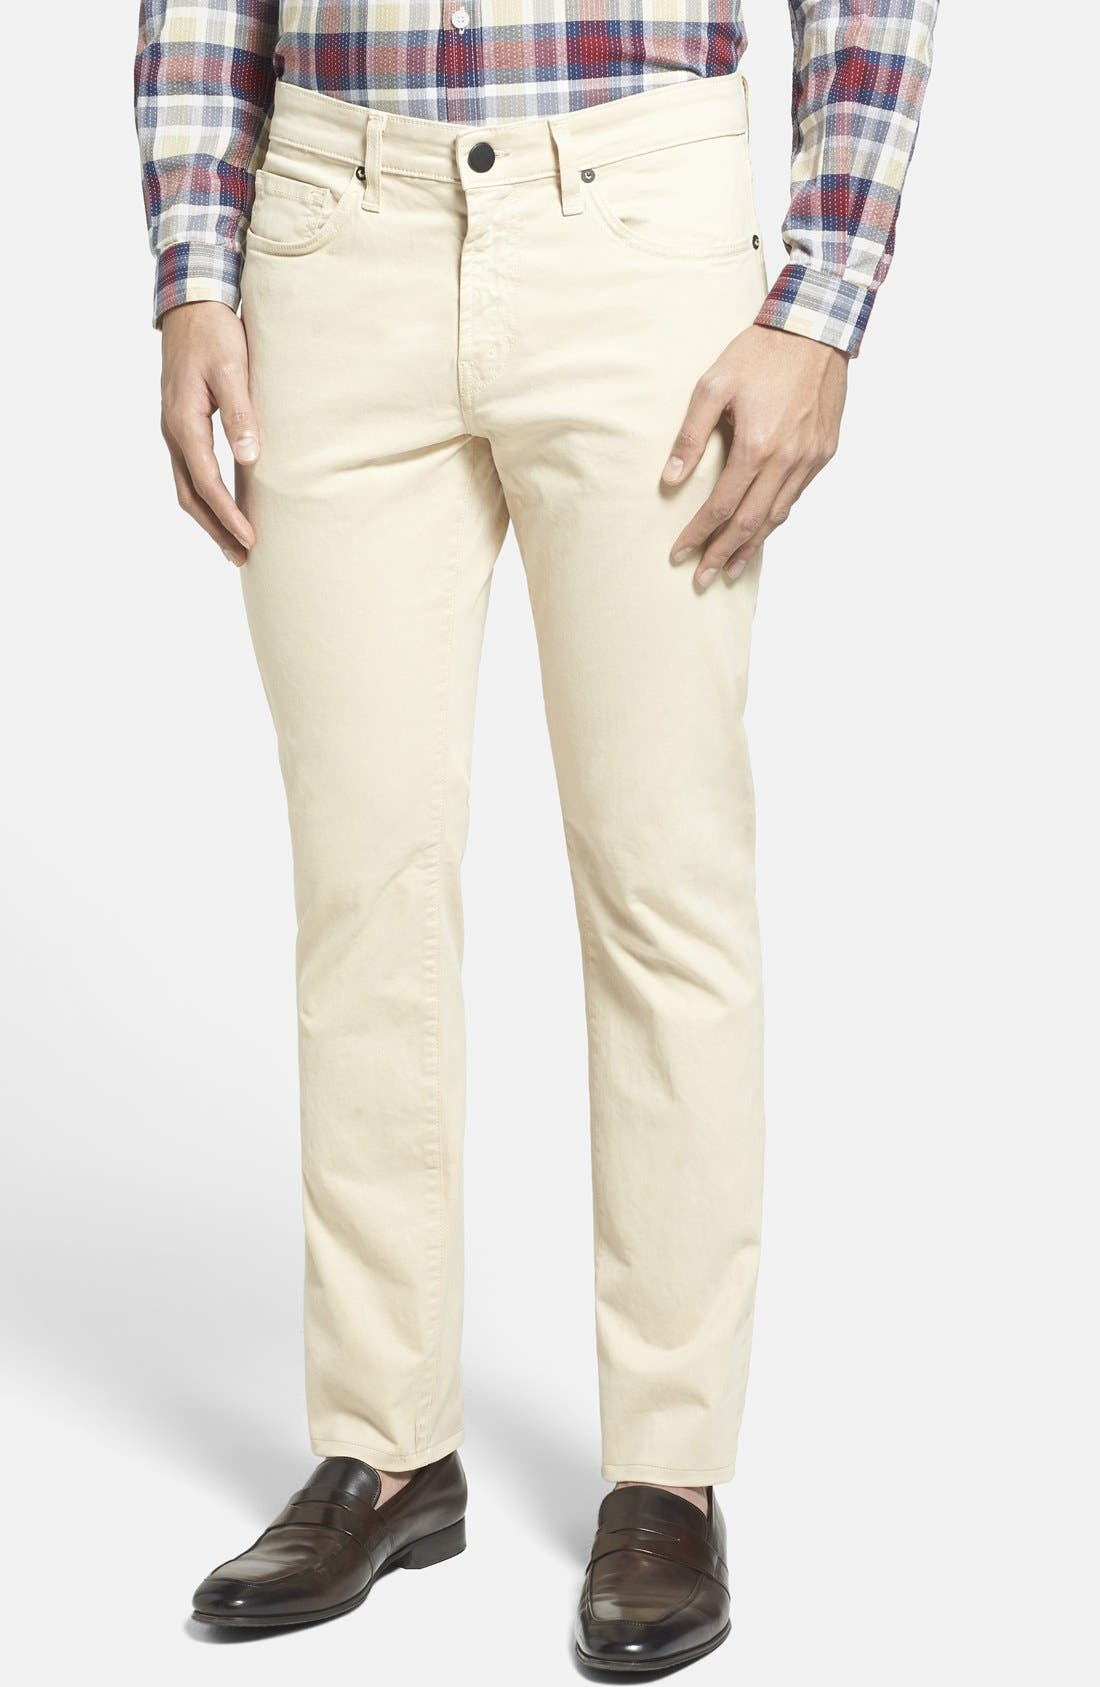 Alternate Image 1 Selected - J Brand 'Kane' Slim Fit Cotton Twill Pants